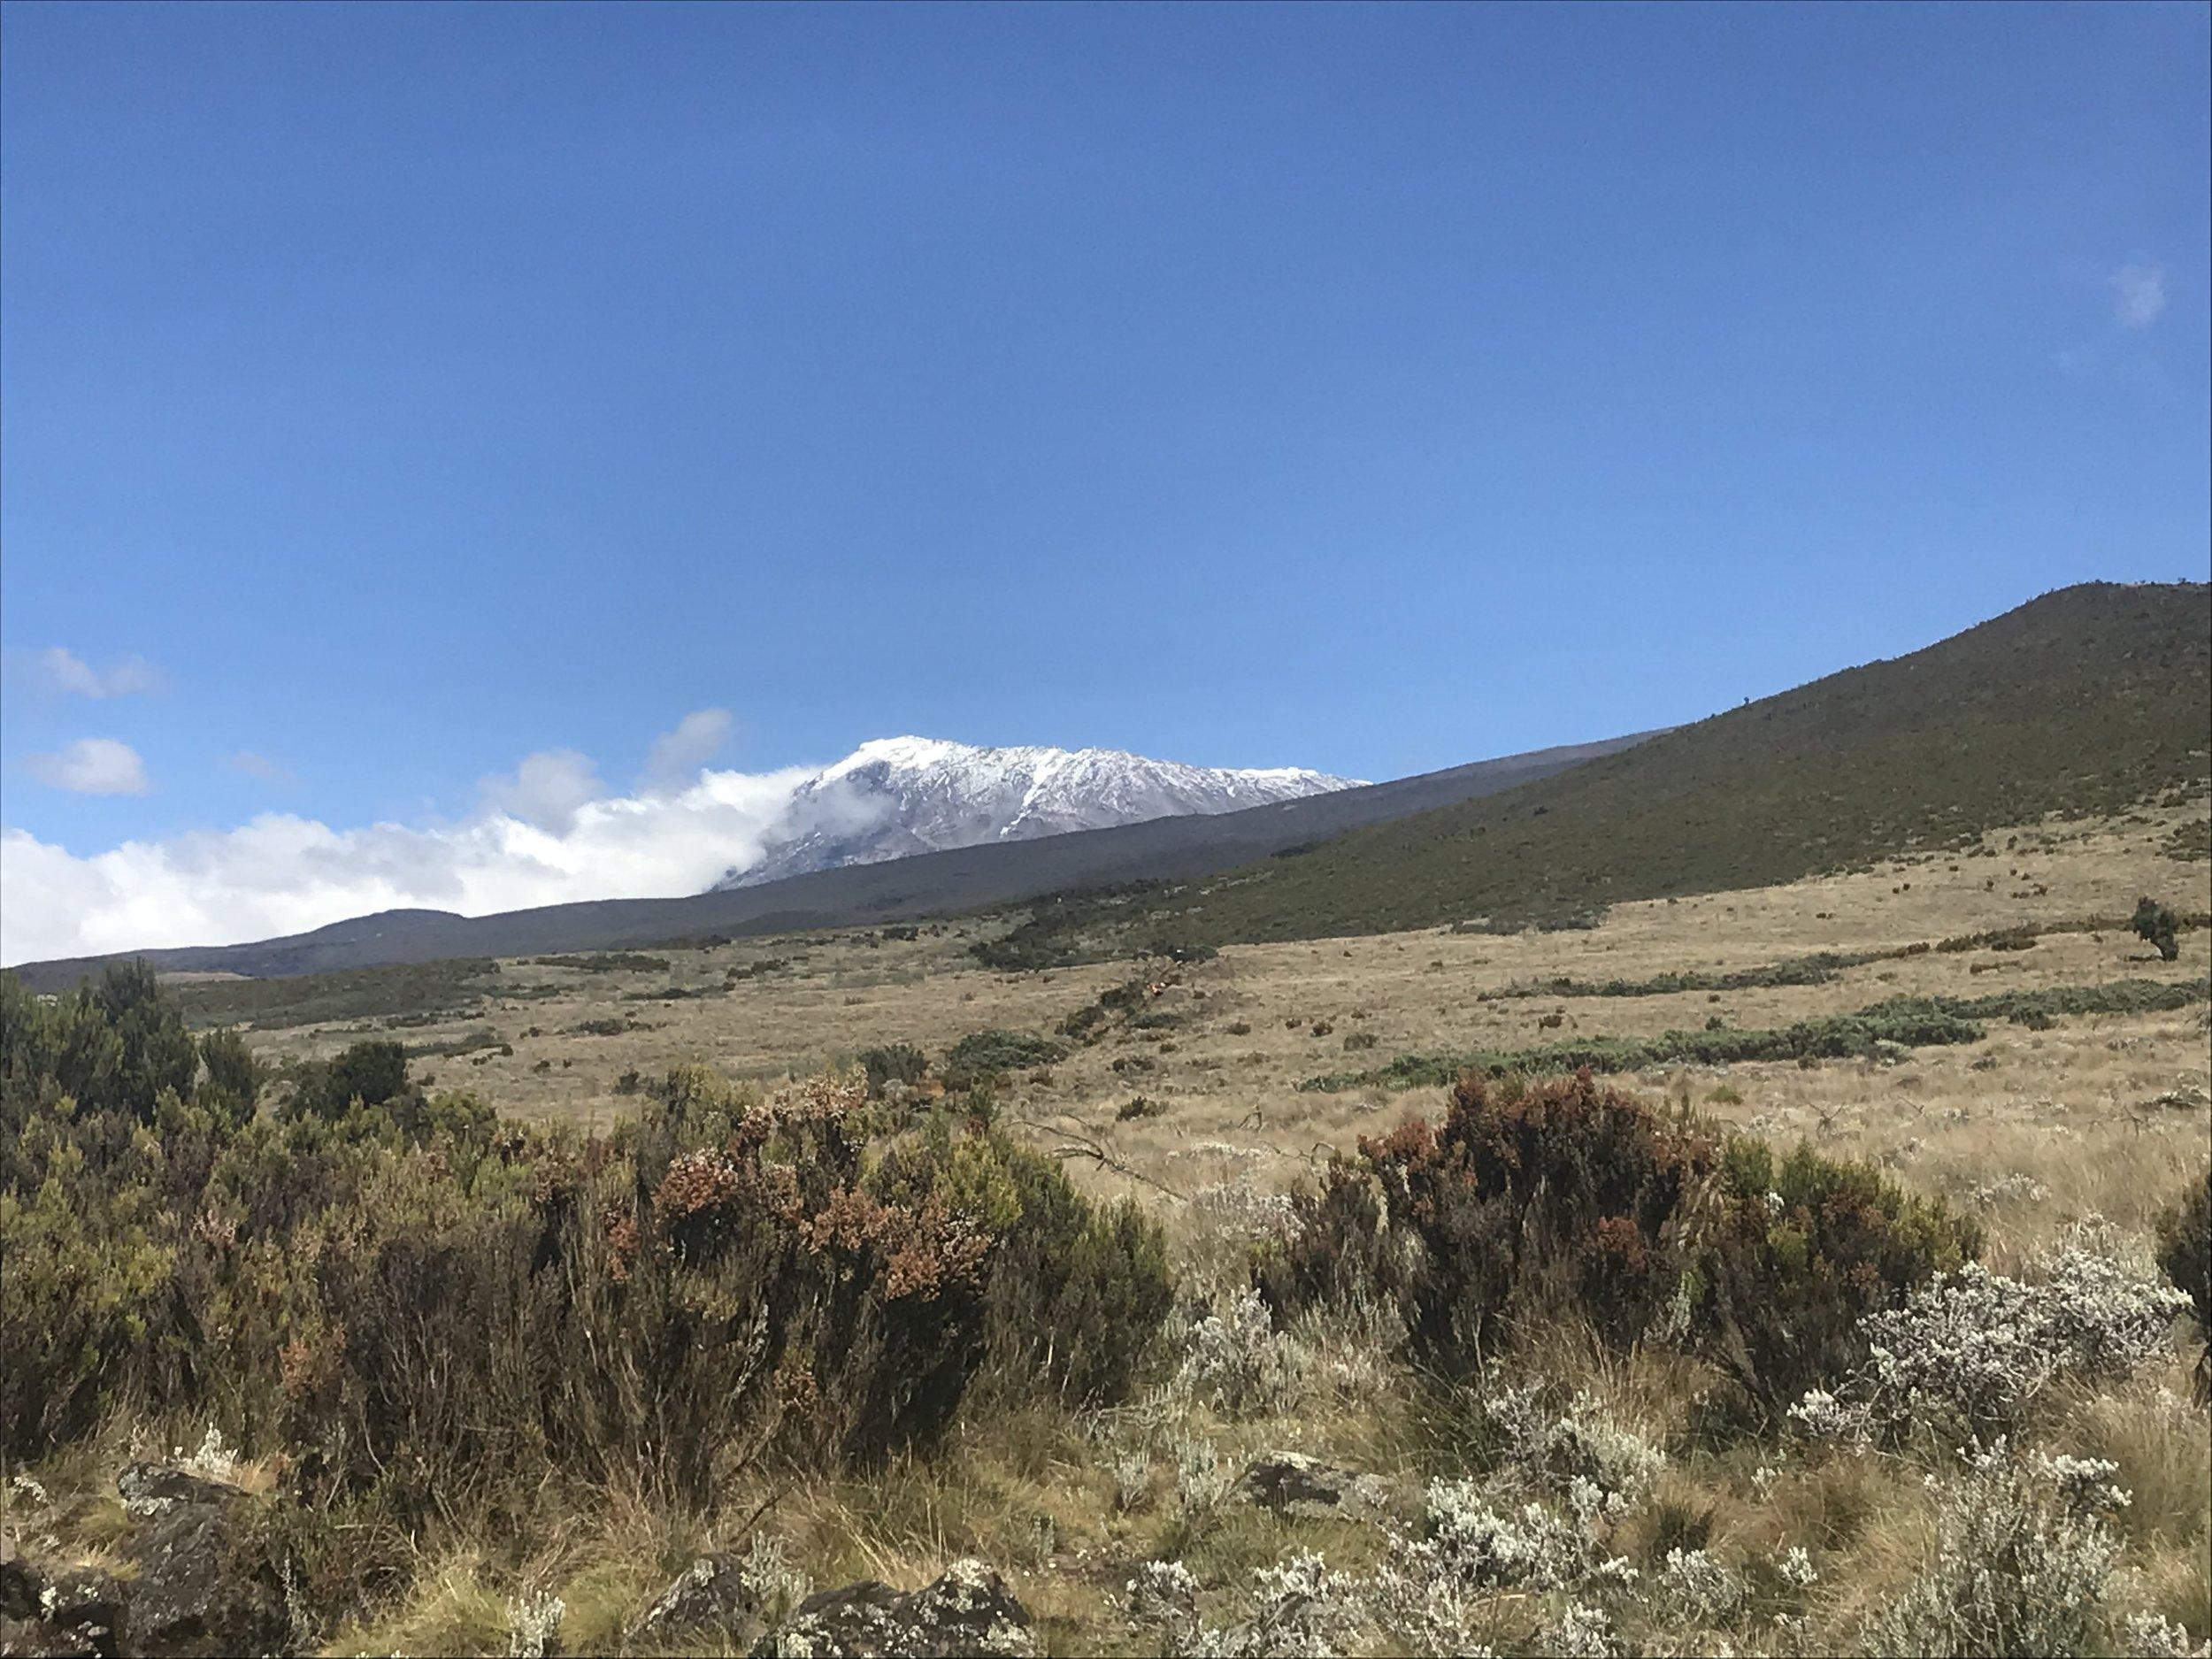 Acclimation hike views above Horombo Huts of Uhuru Peak, our summit destination.